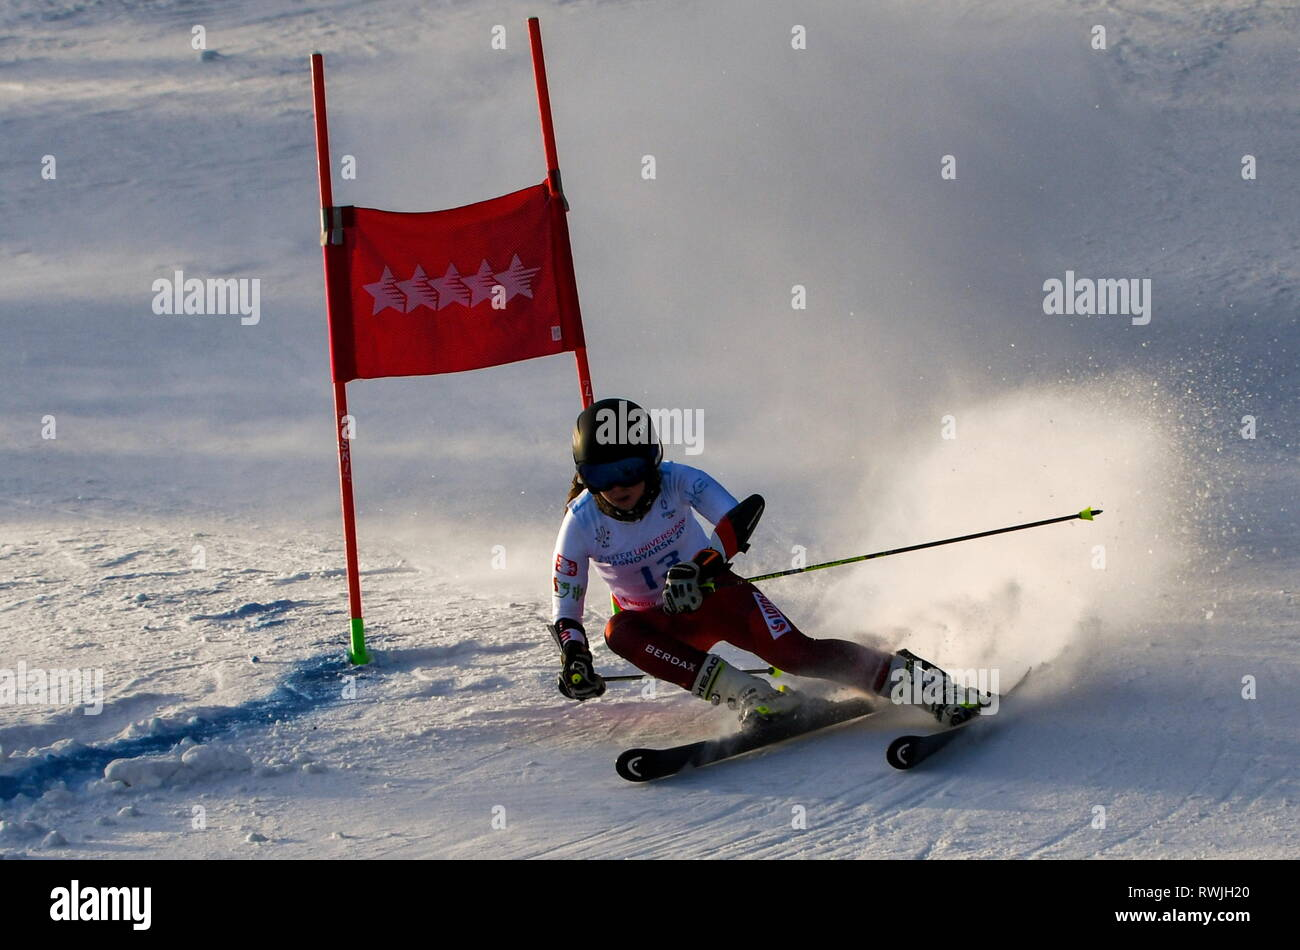 Krasnoyarsk, Russia. 07th Mar, 2019. KRASNOYARSK, RUSSIA - MARCH 7, 2019: Skier Katarzyna Wasek of Poland competes in the women's giant slalom event at Bobrovy Log Funpark as part of the Krasnoyarsk 2019 Winter Universiade. Kirill Kukhmar/TASS Credit: ITAR-TASS News Agency/Alamy Live News - Stock Image